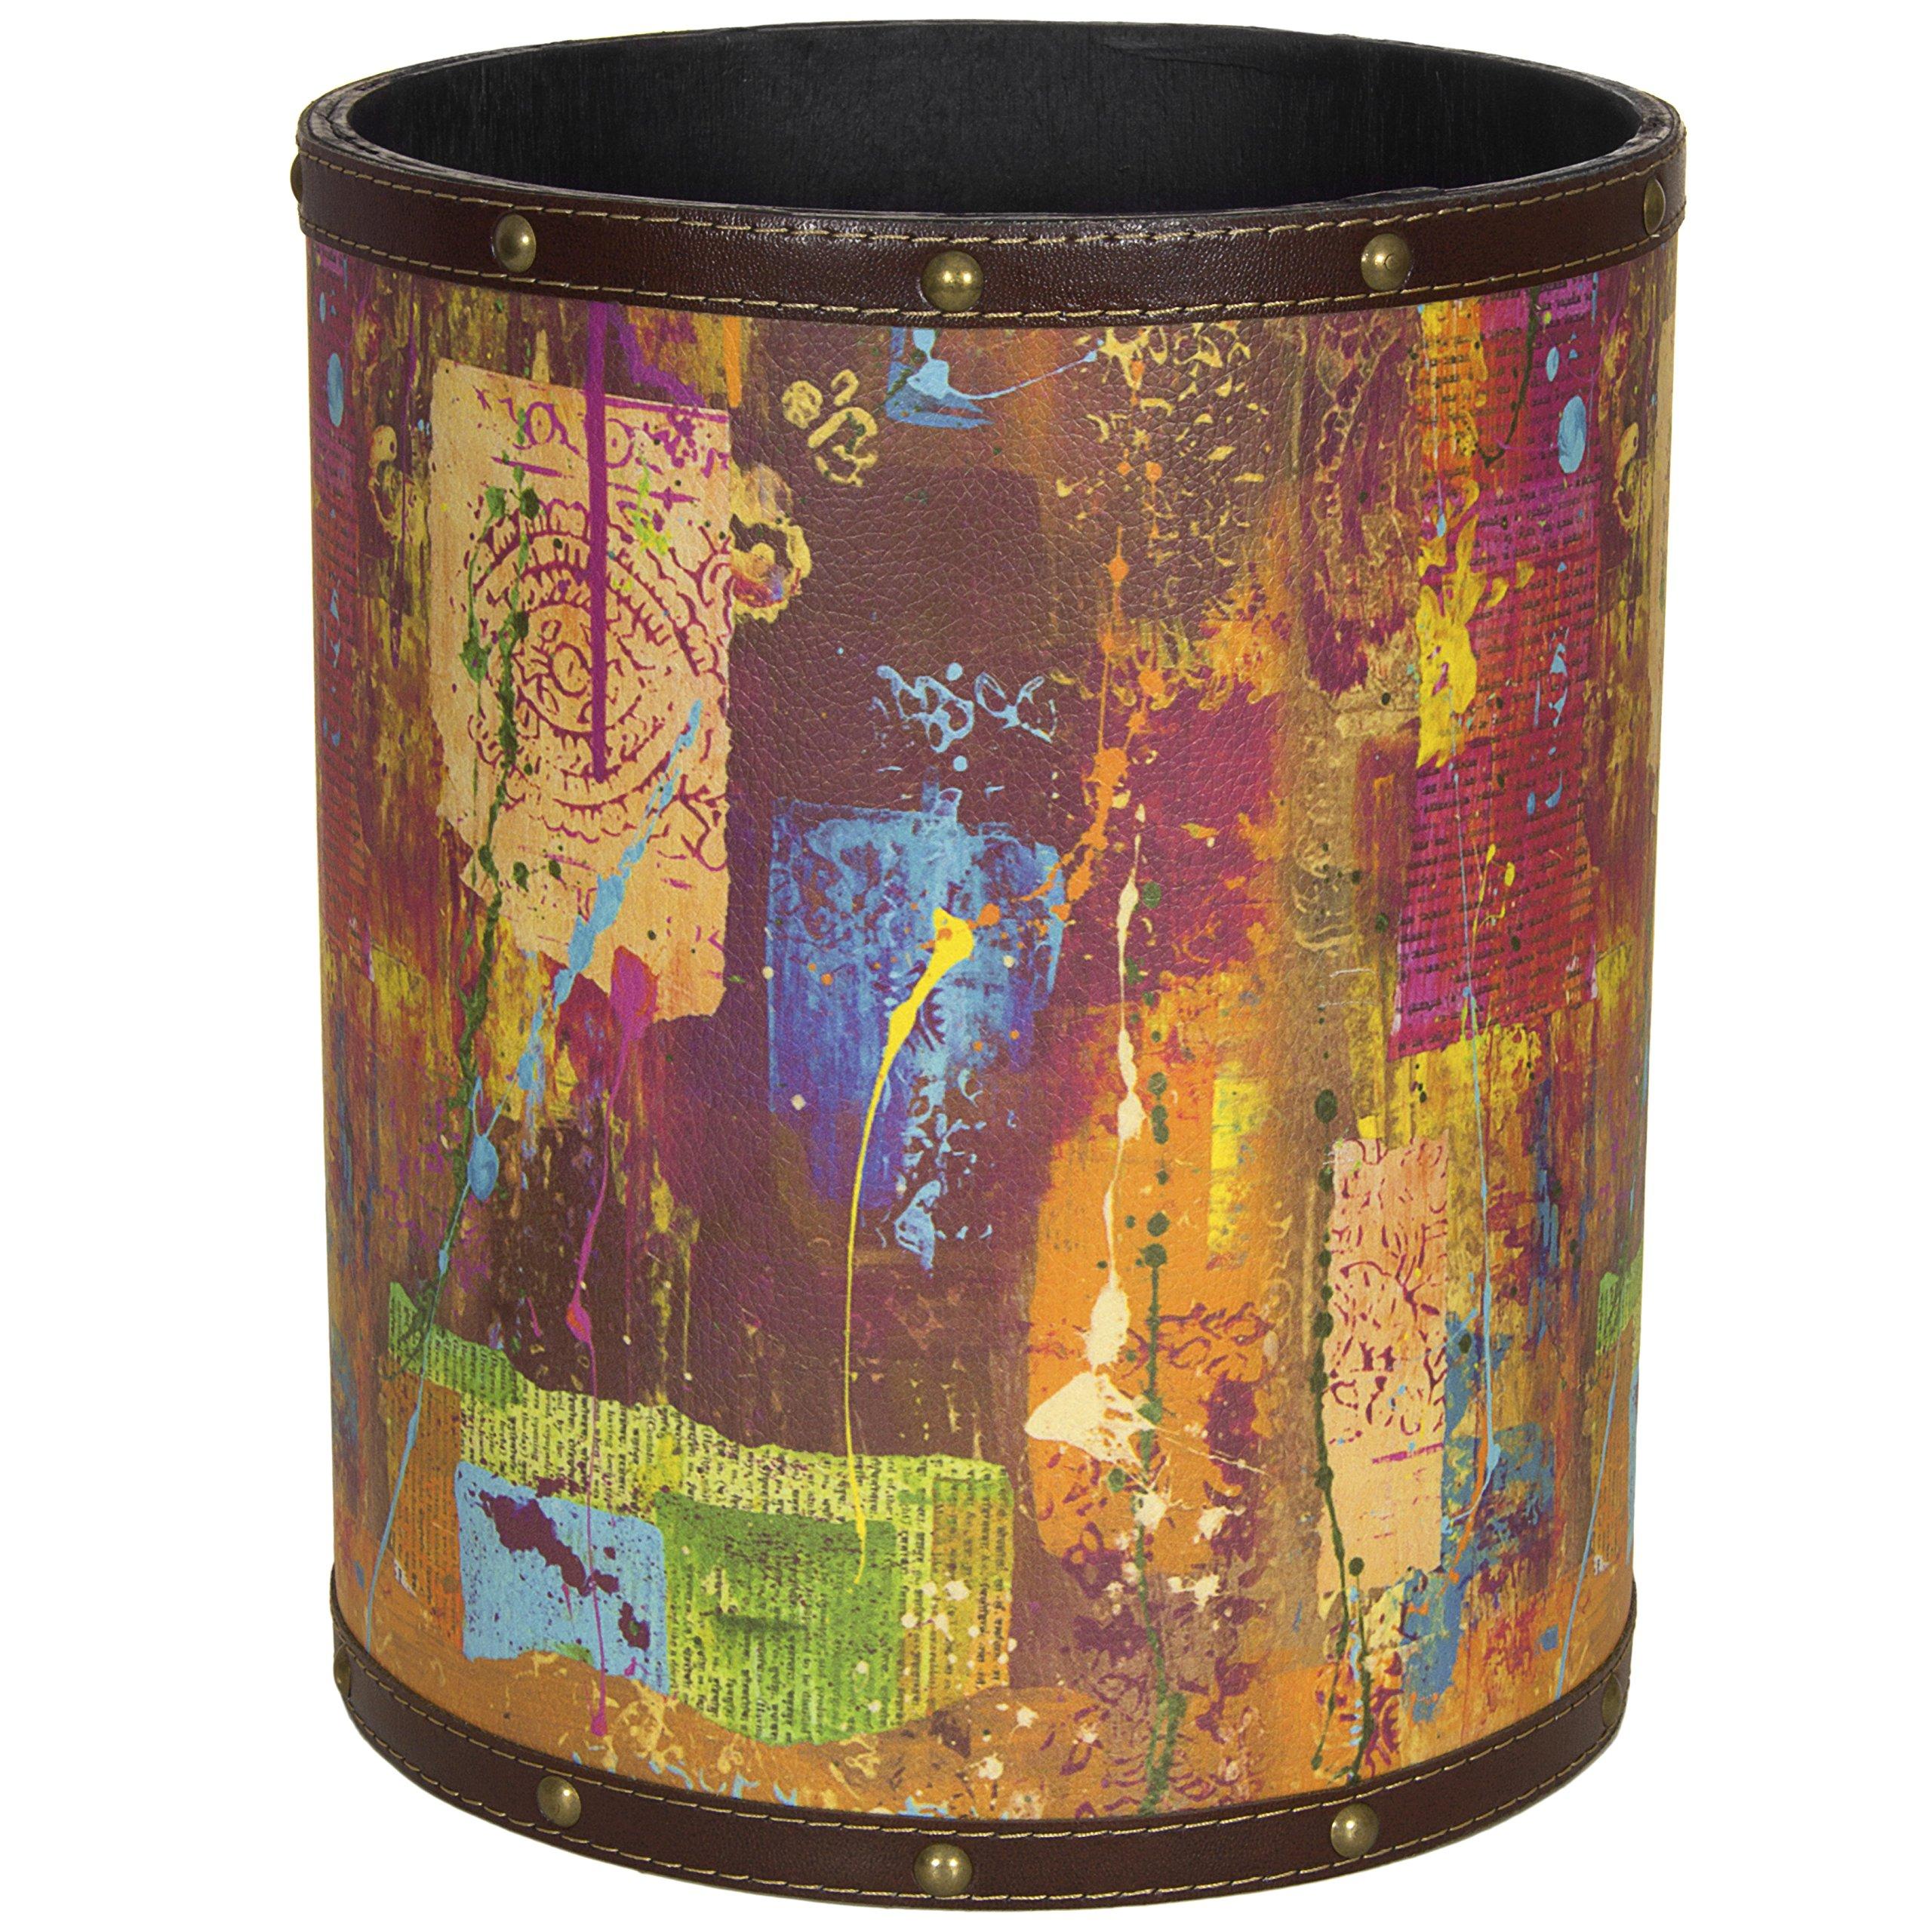 Oriental Furniture CAN-WST-GITA13 India by Gita Waste Basket